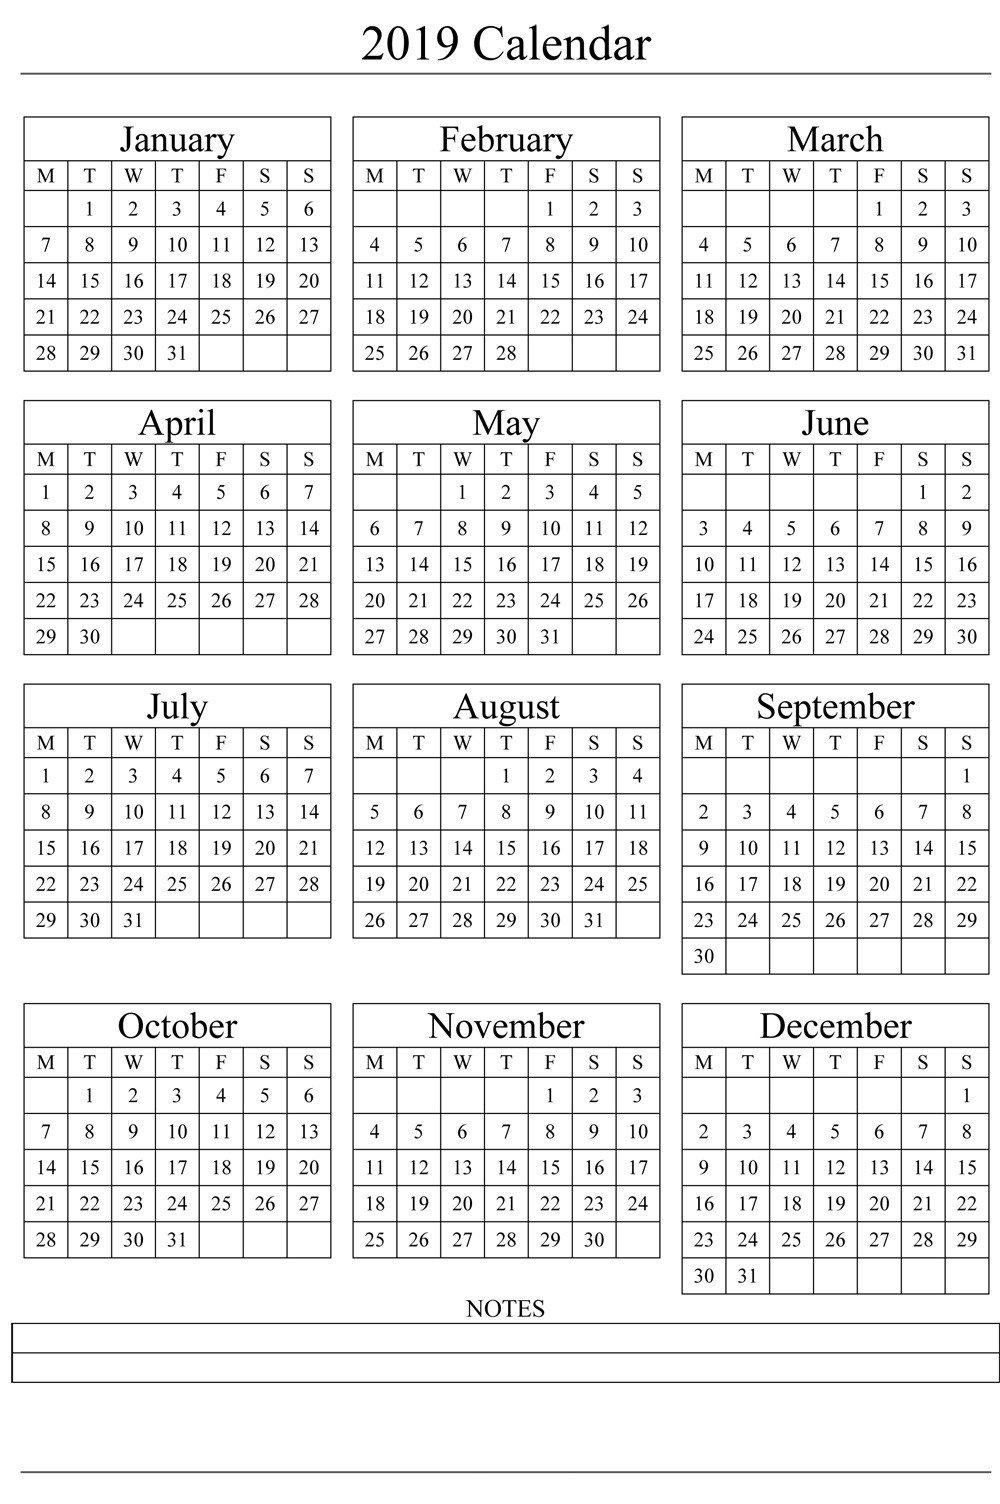 2019 Printable Calendar Templates - Blank Word Pdf - Calendar End Calendar 2019 Template Pdf